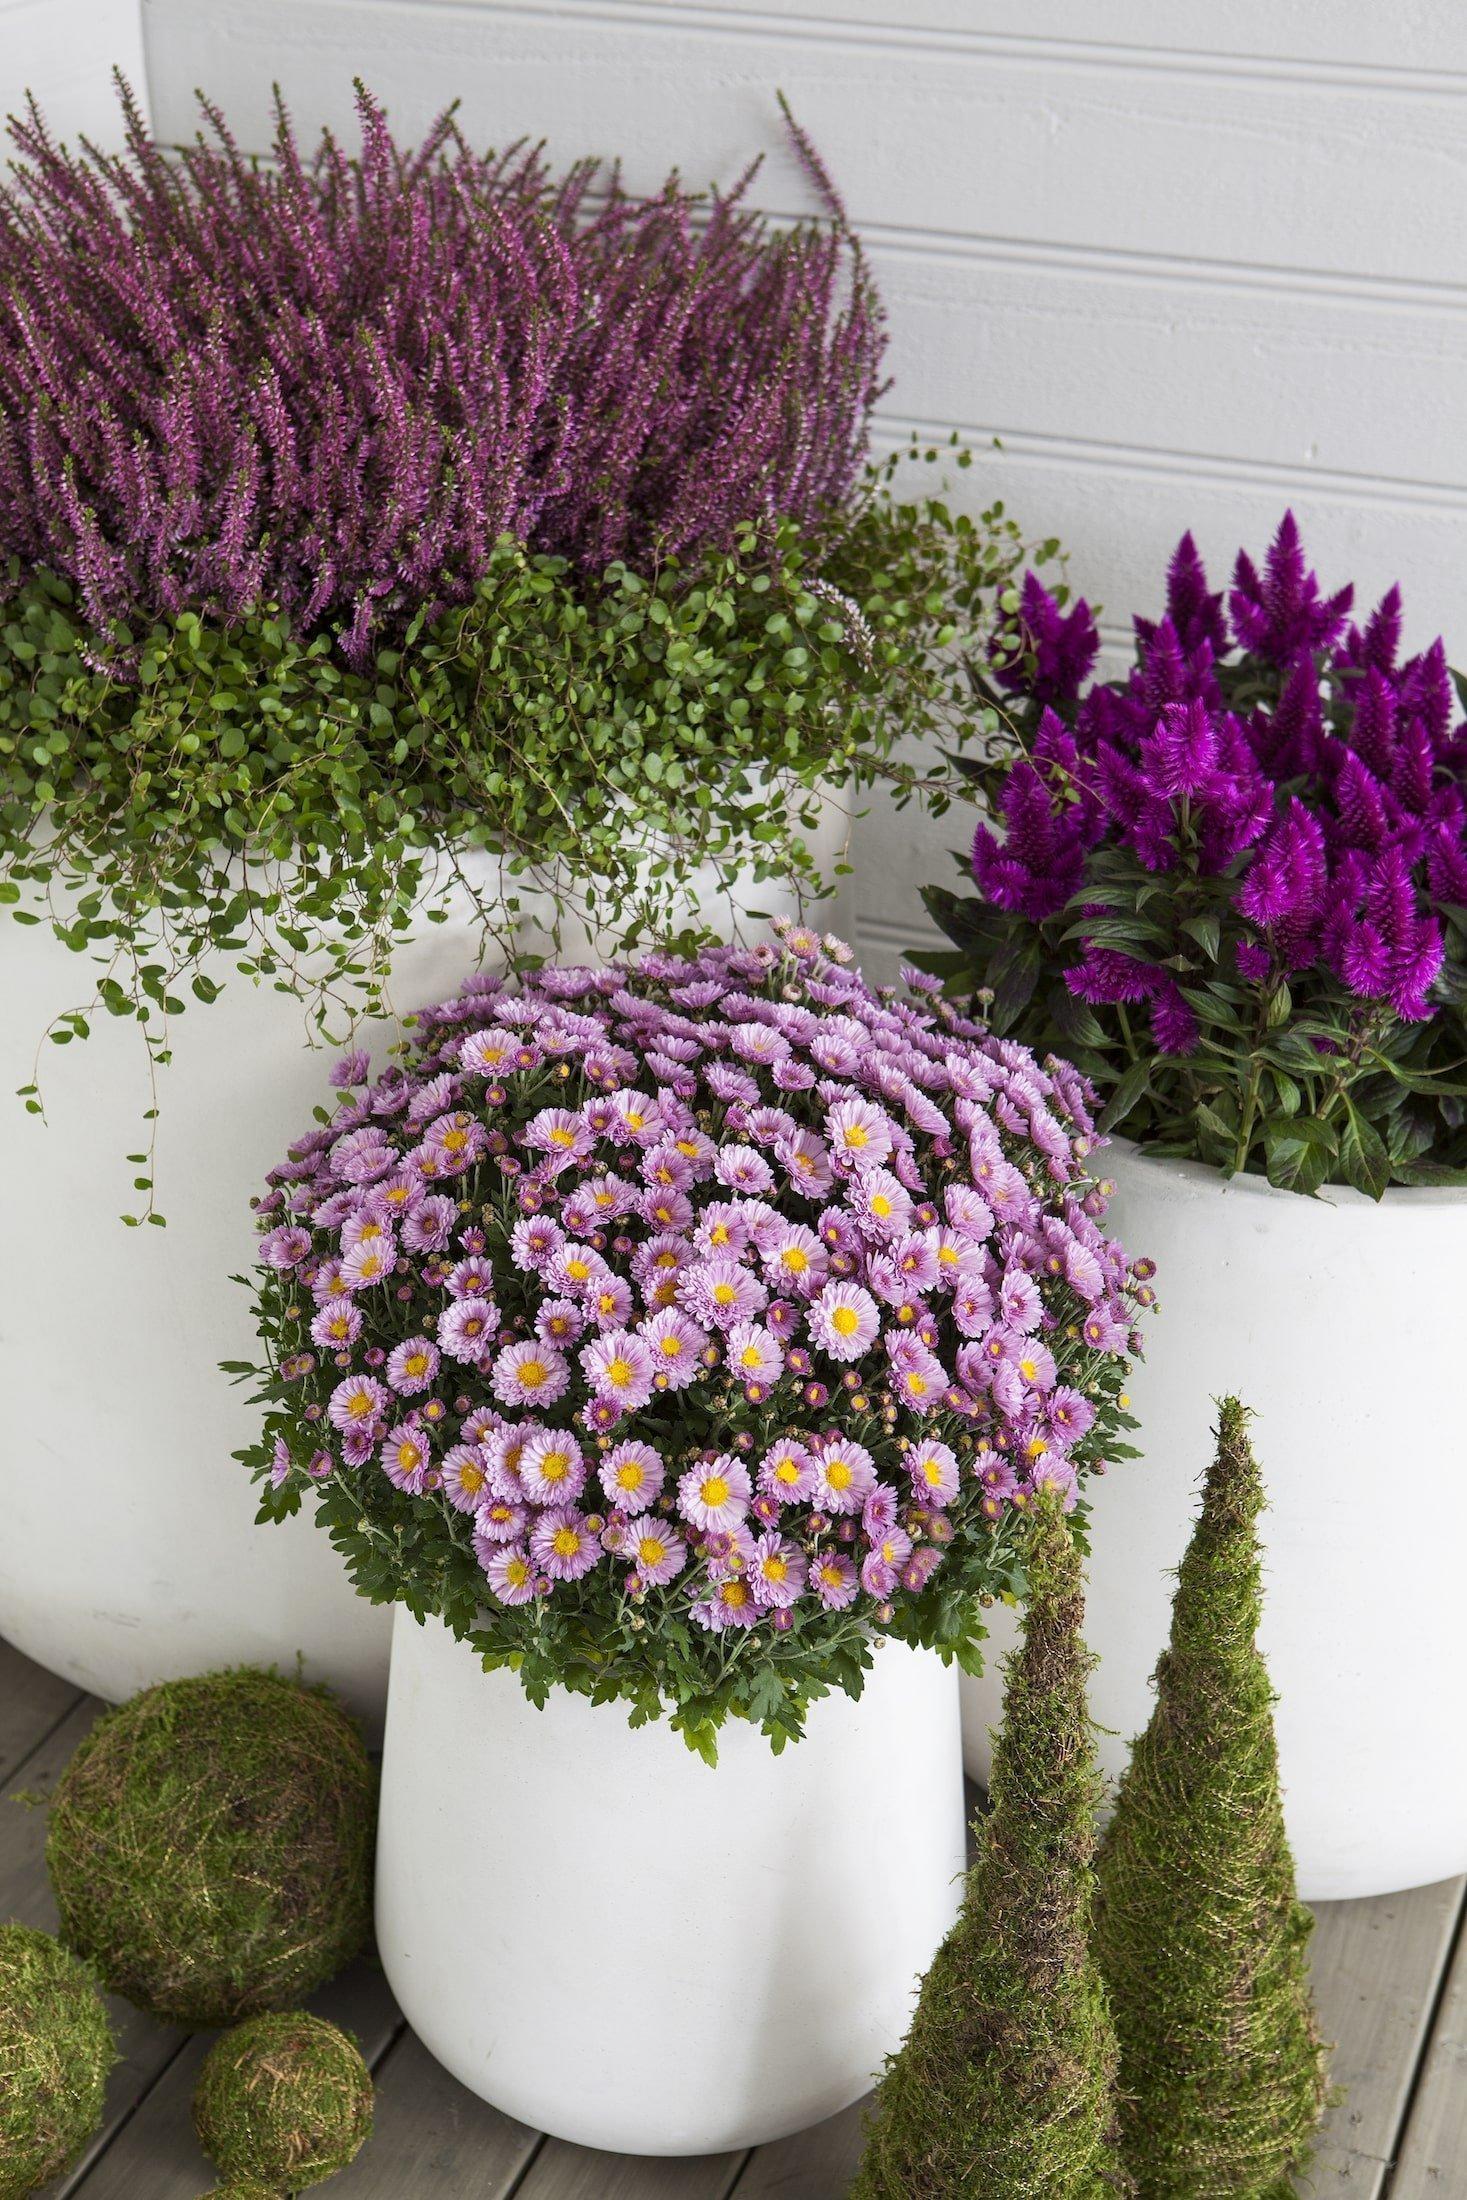 Barevné truhlíky plné mrazuvzdorných rostlin